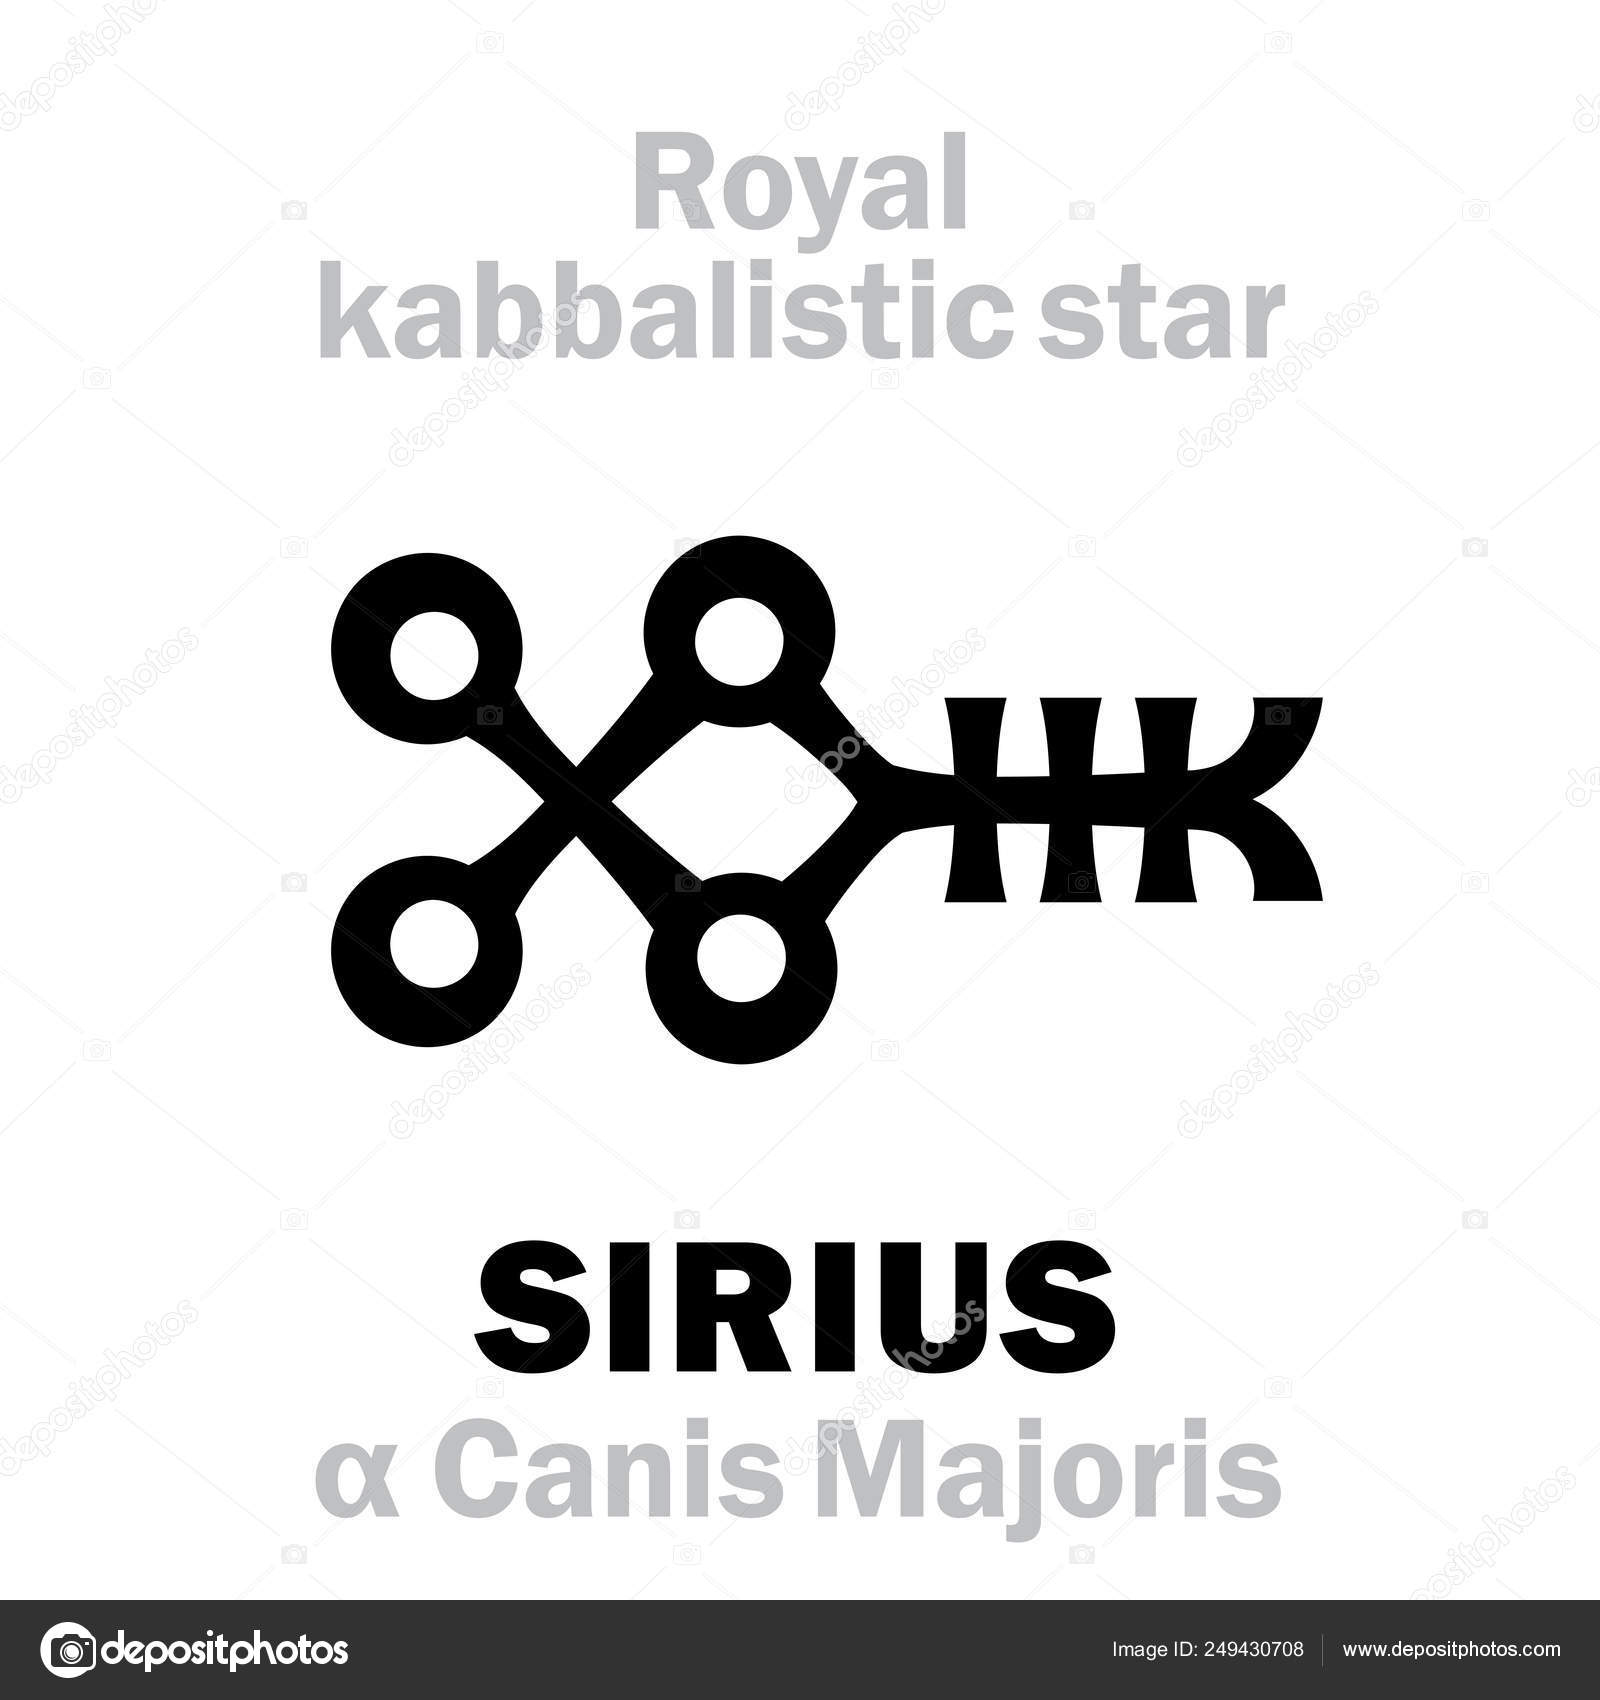 Astrology: SIRIUS (The Royal Behenian kabbalistic star